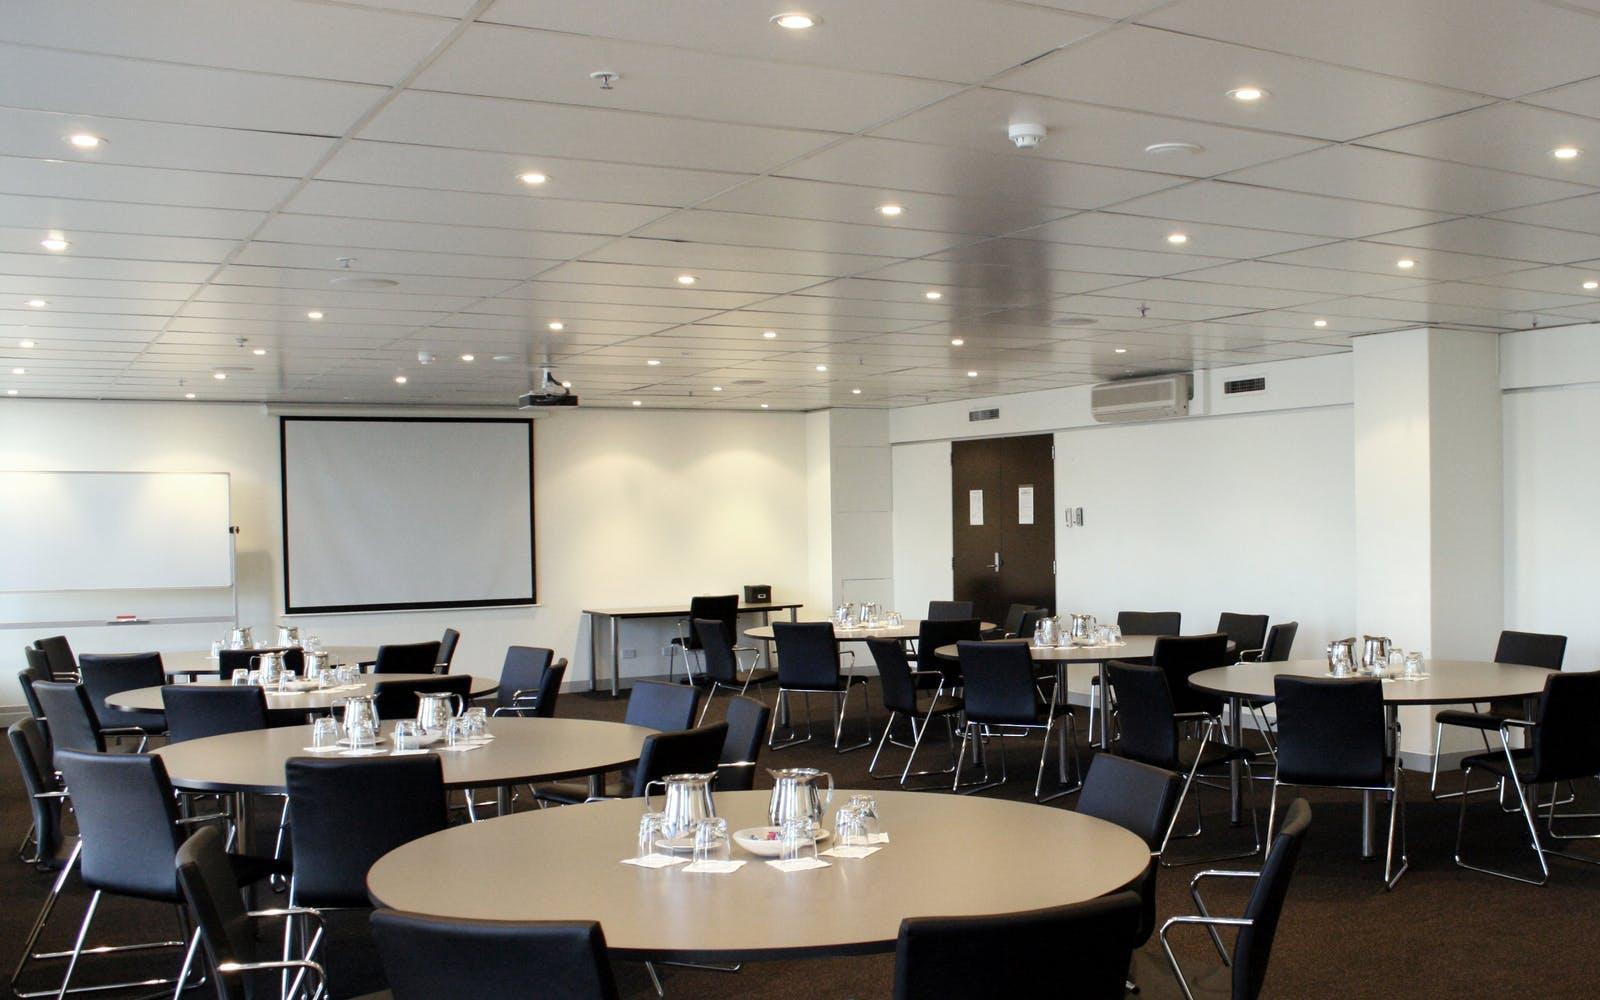 Medium Room, function room at Karstens Brisbane, image 1